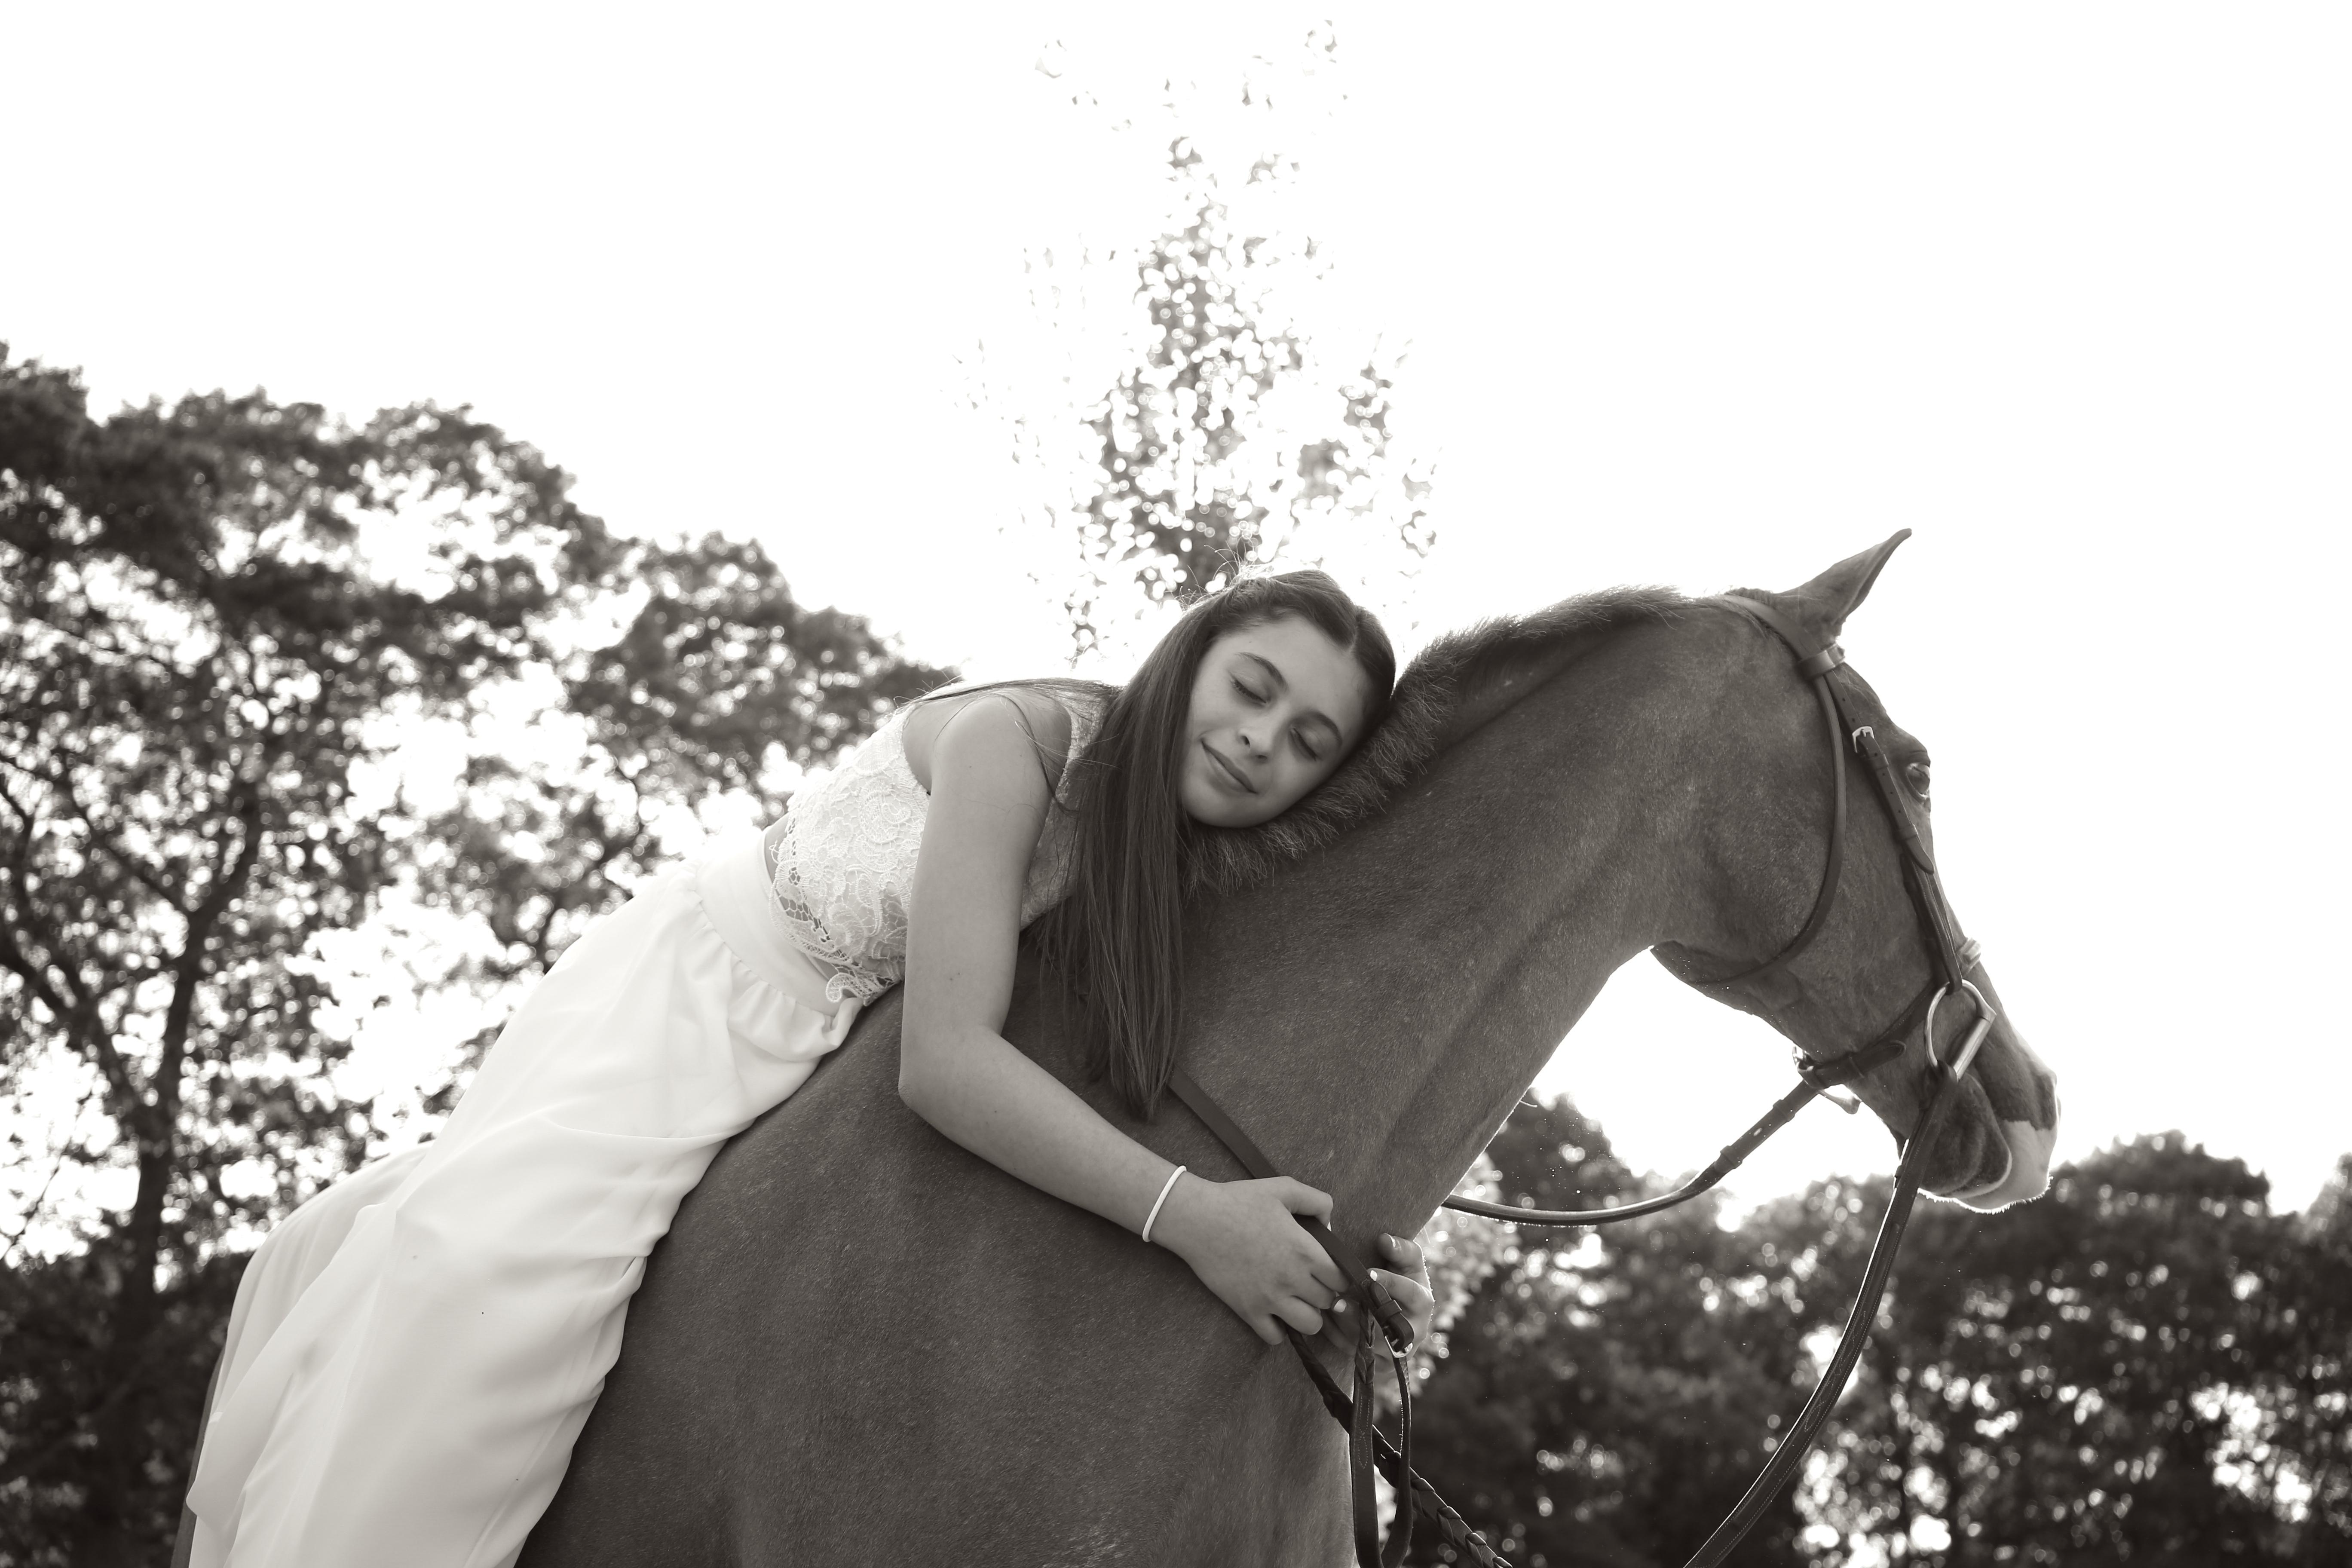 Horse hug